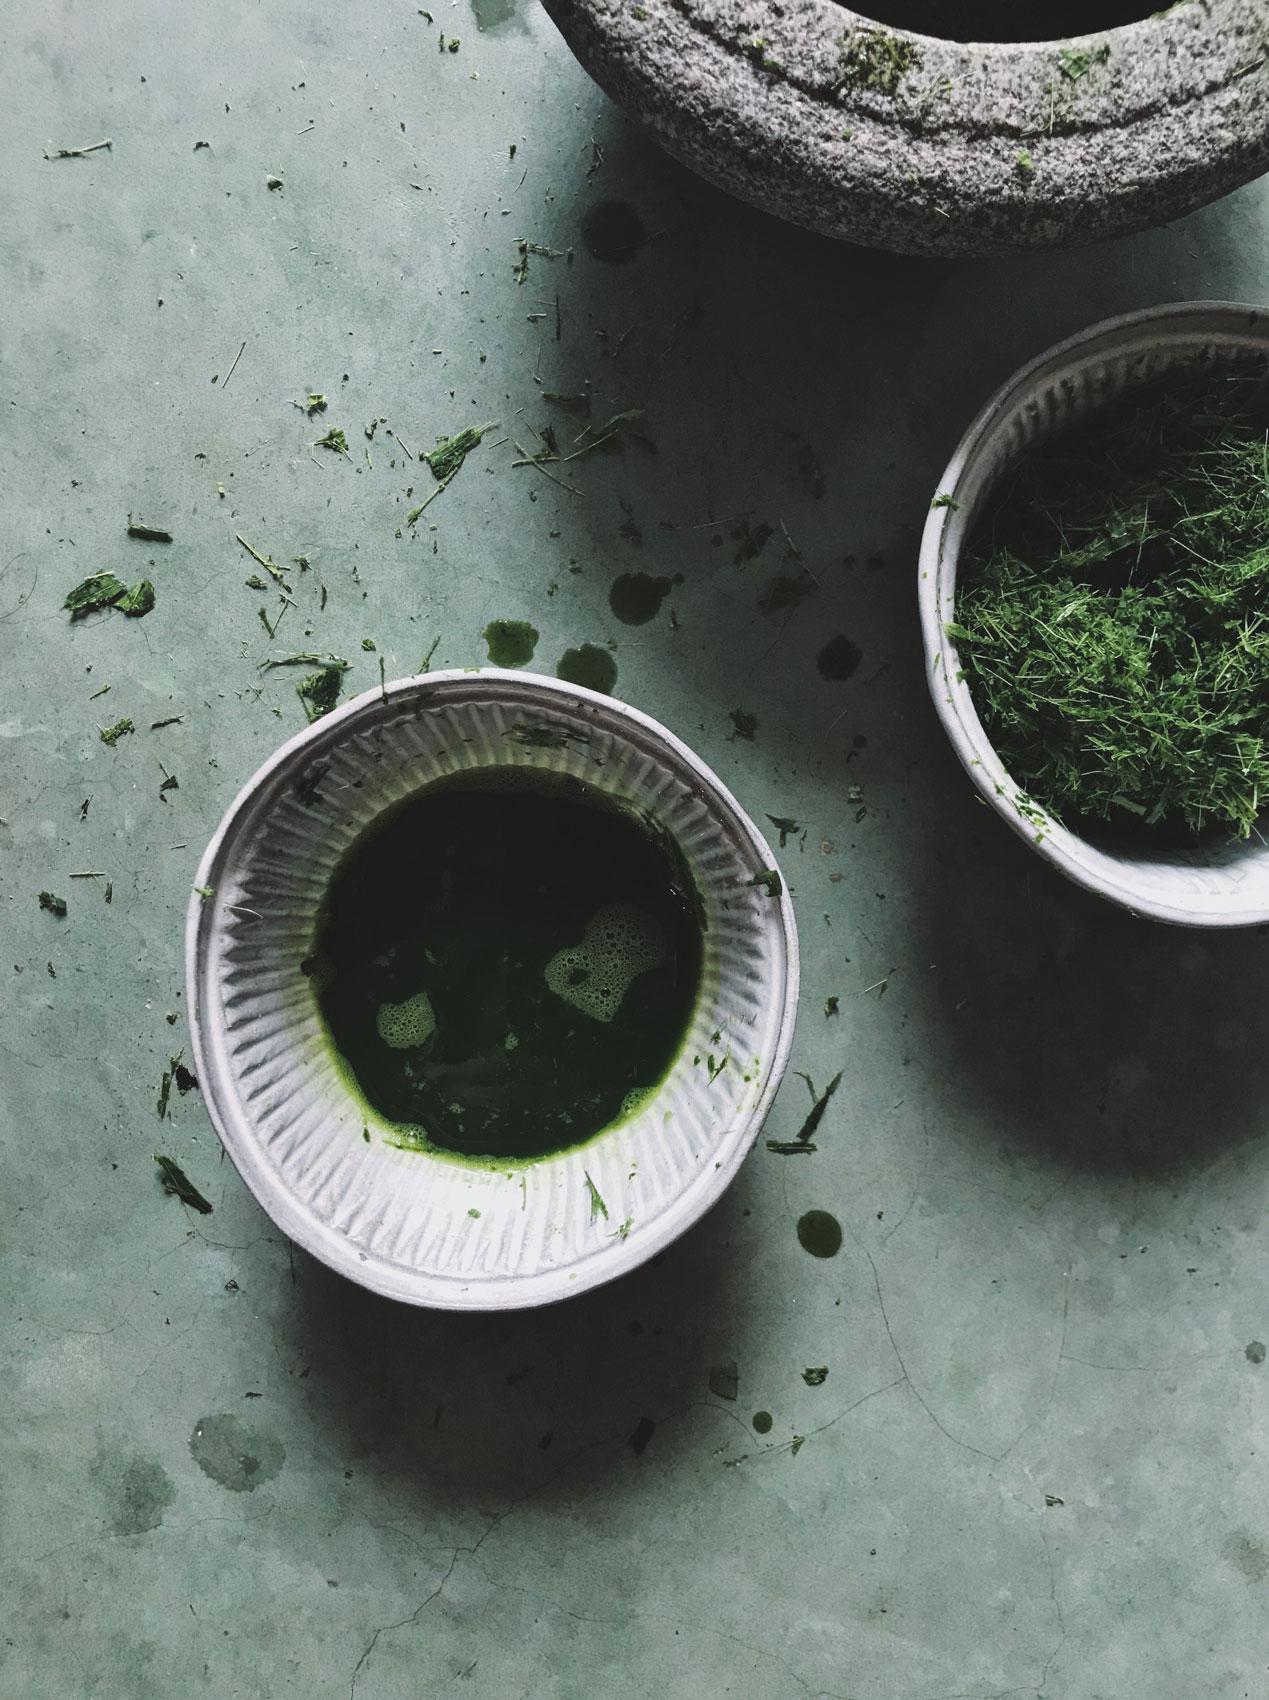 A ceramic dish holding a soft green liquid.